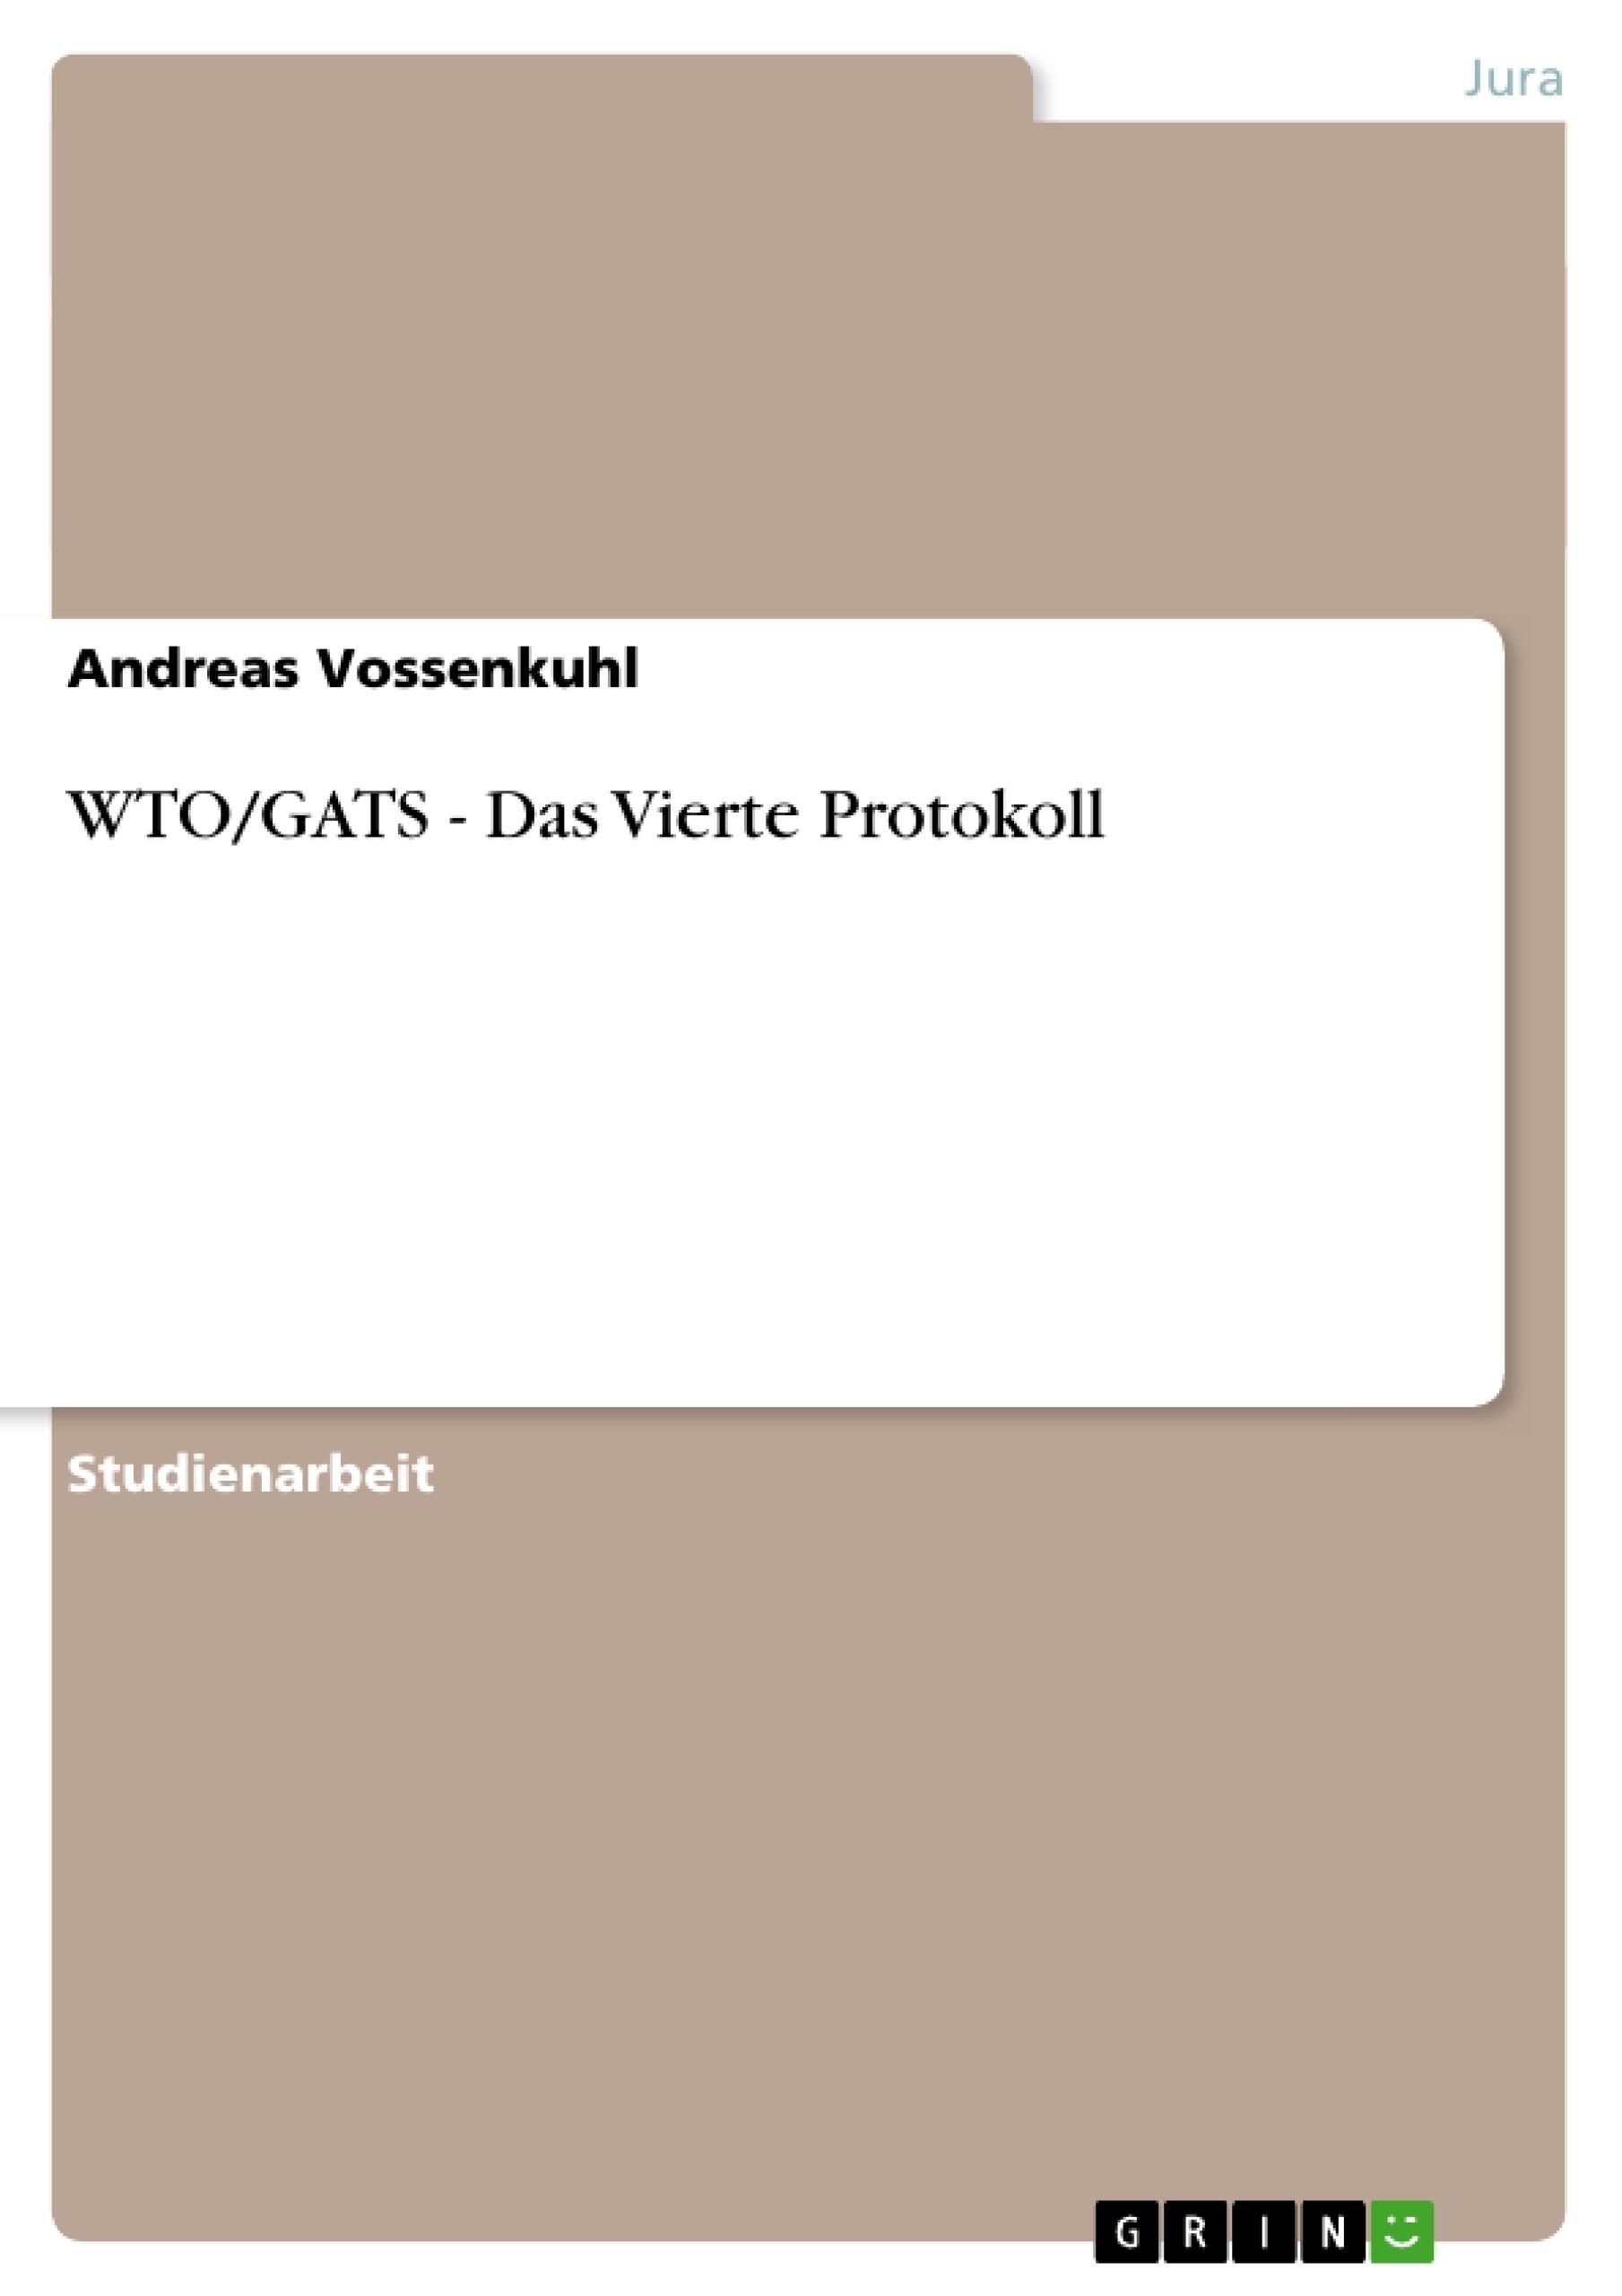 Titel: WTO/GATS - Das Vierte Protokoll